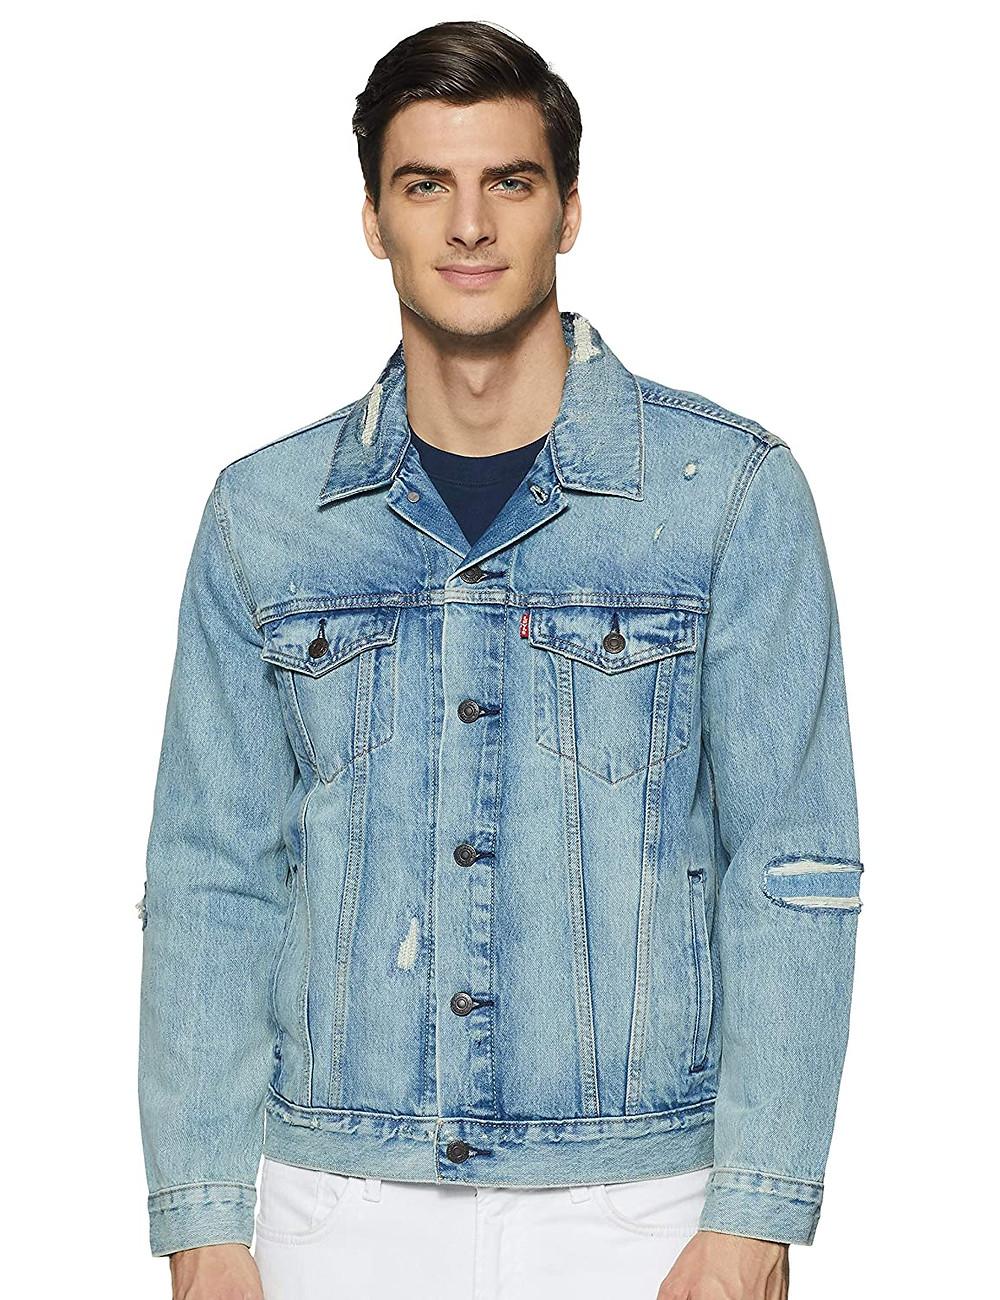 Denim Jackets For Men: 26 Jeans Jacket Outfit Ideas